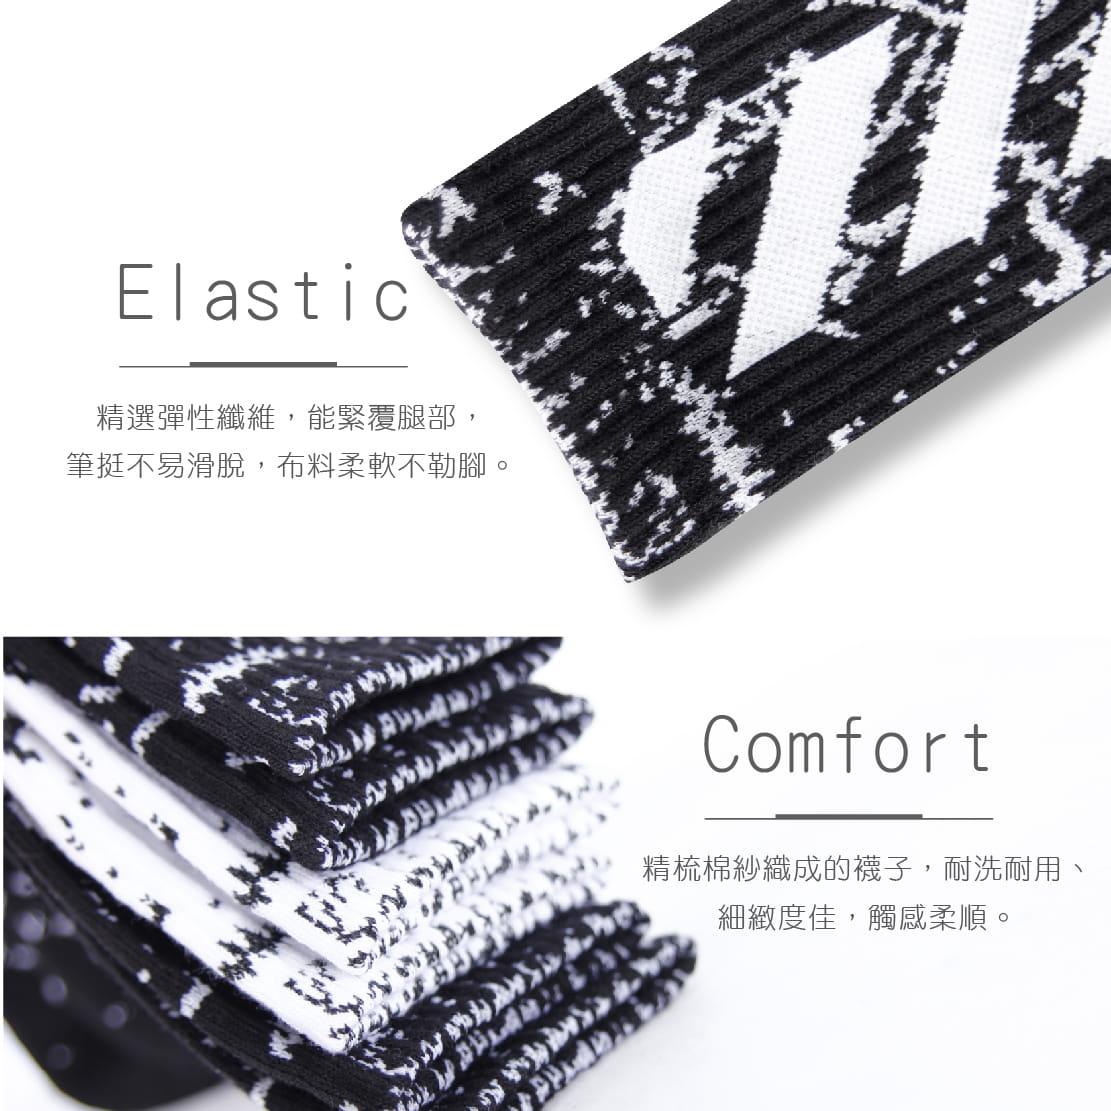 【FAV】ins爆裂紋中筒襪 5